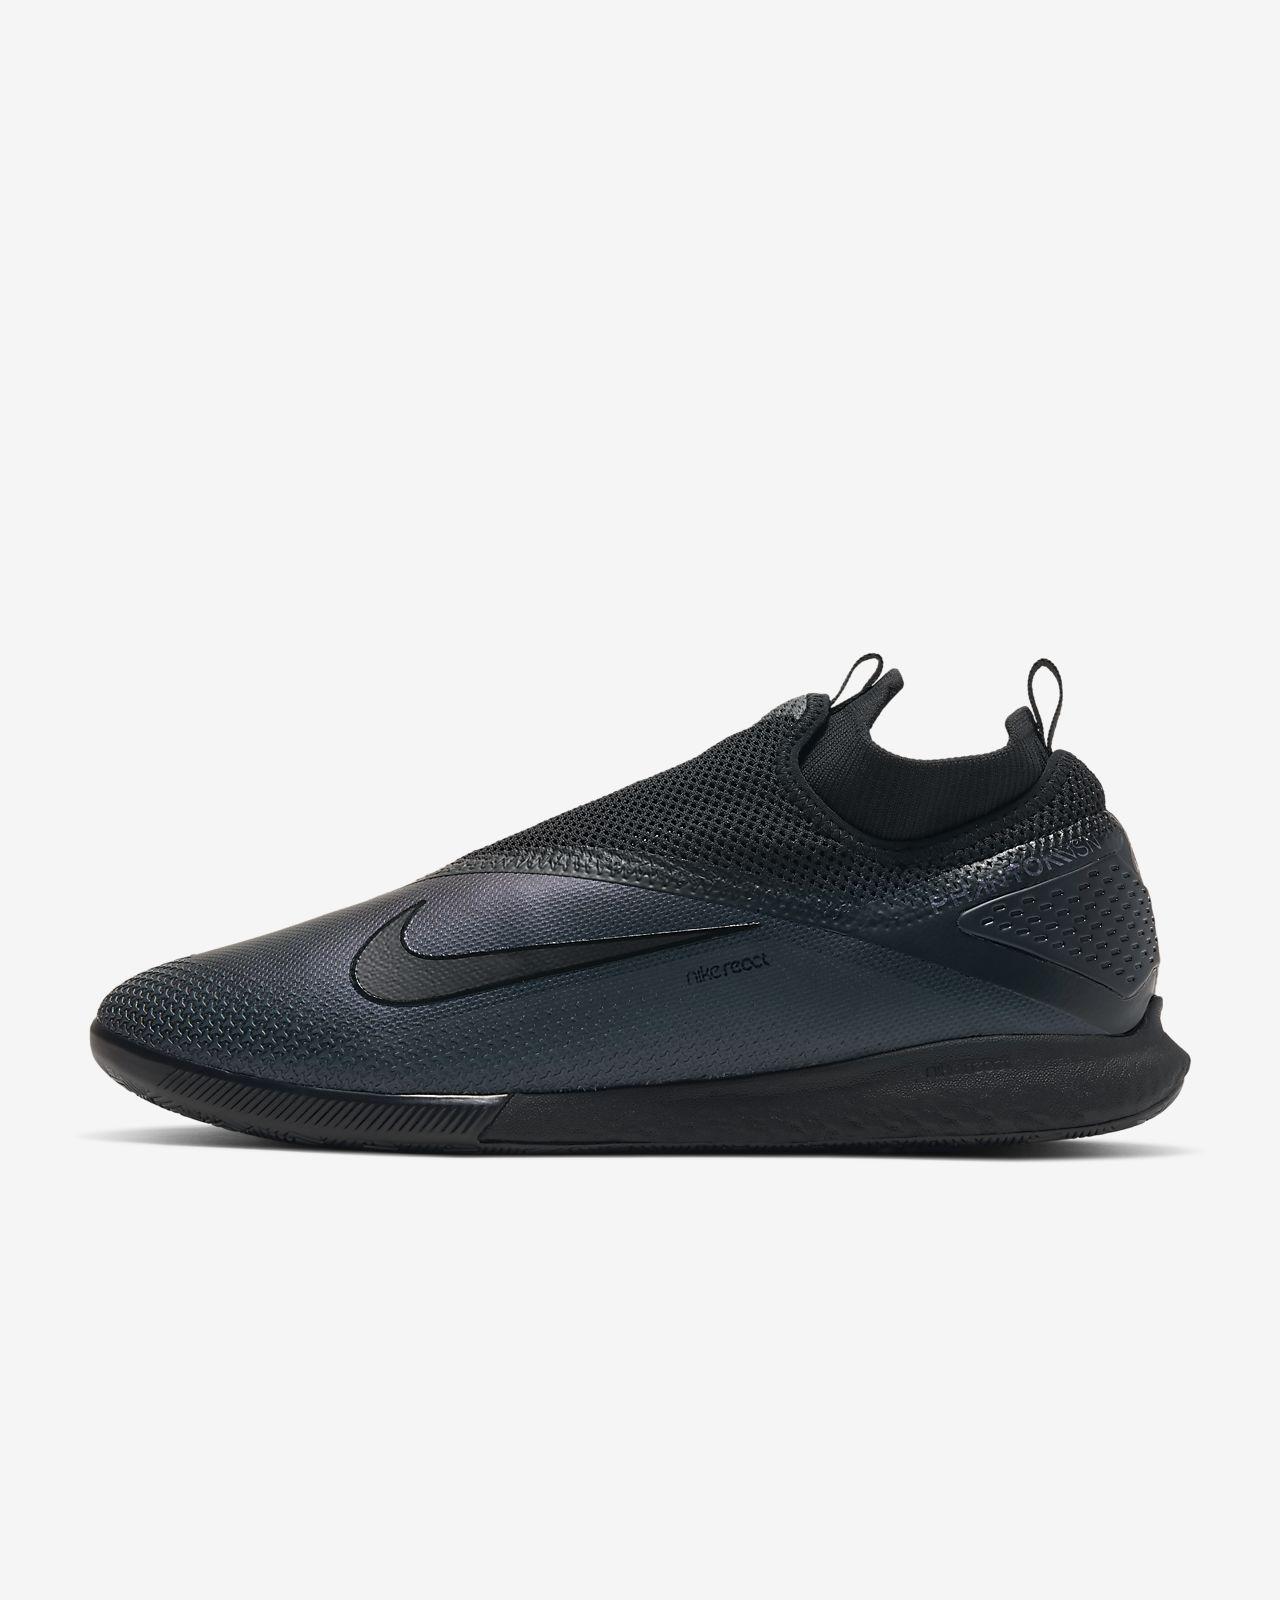 Sapatilhas de futsal Nike React Phantom Vision 2 Pro Dynamic Fit IC